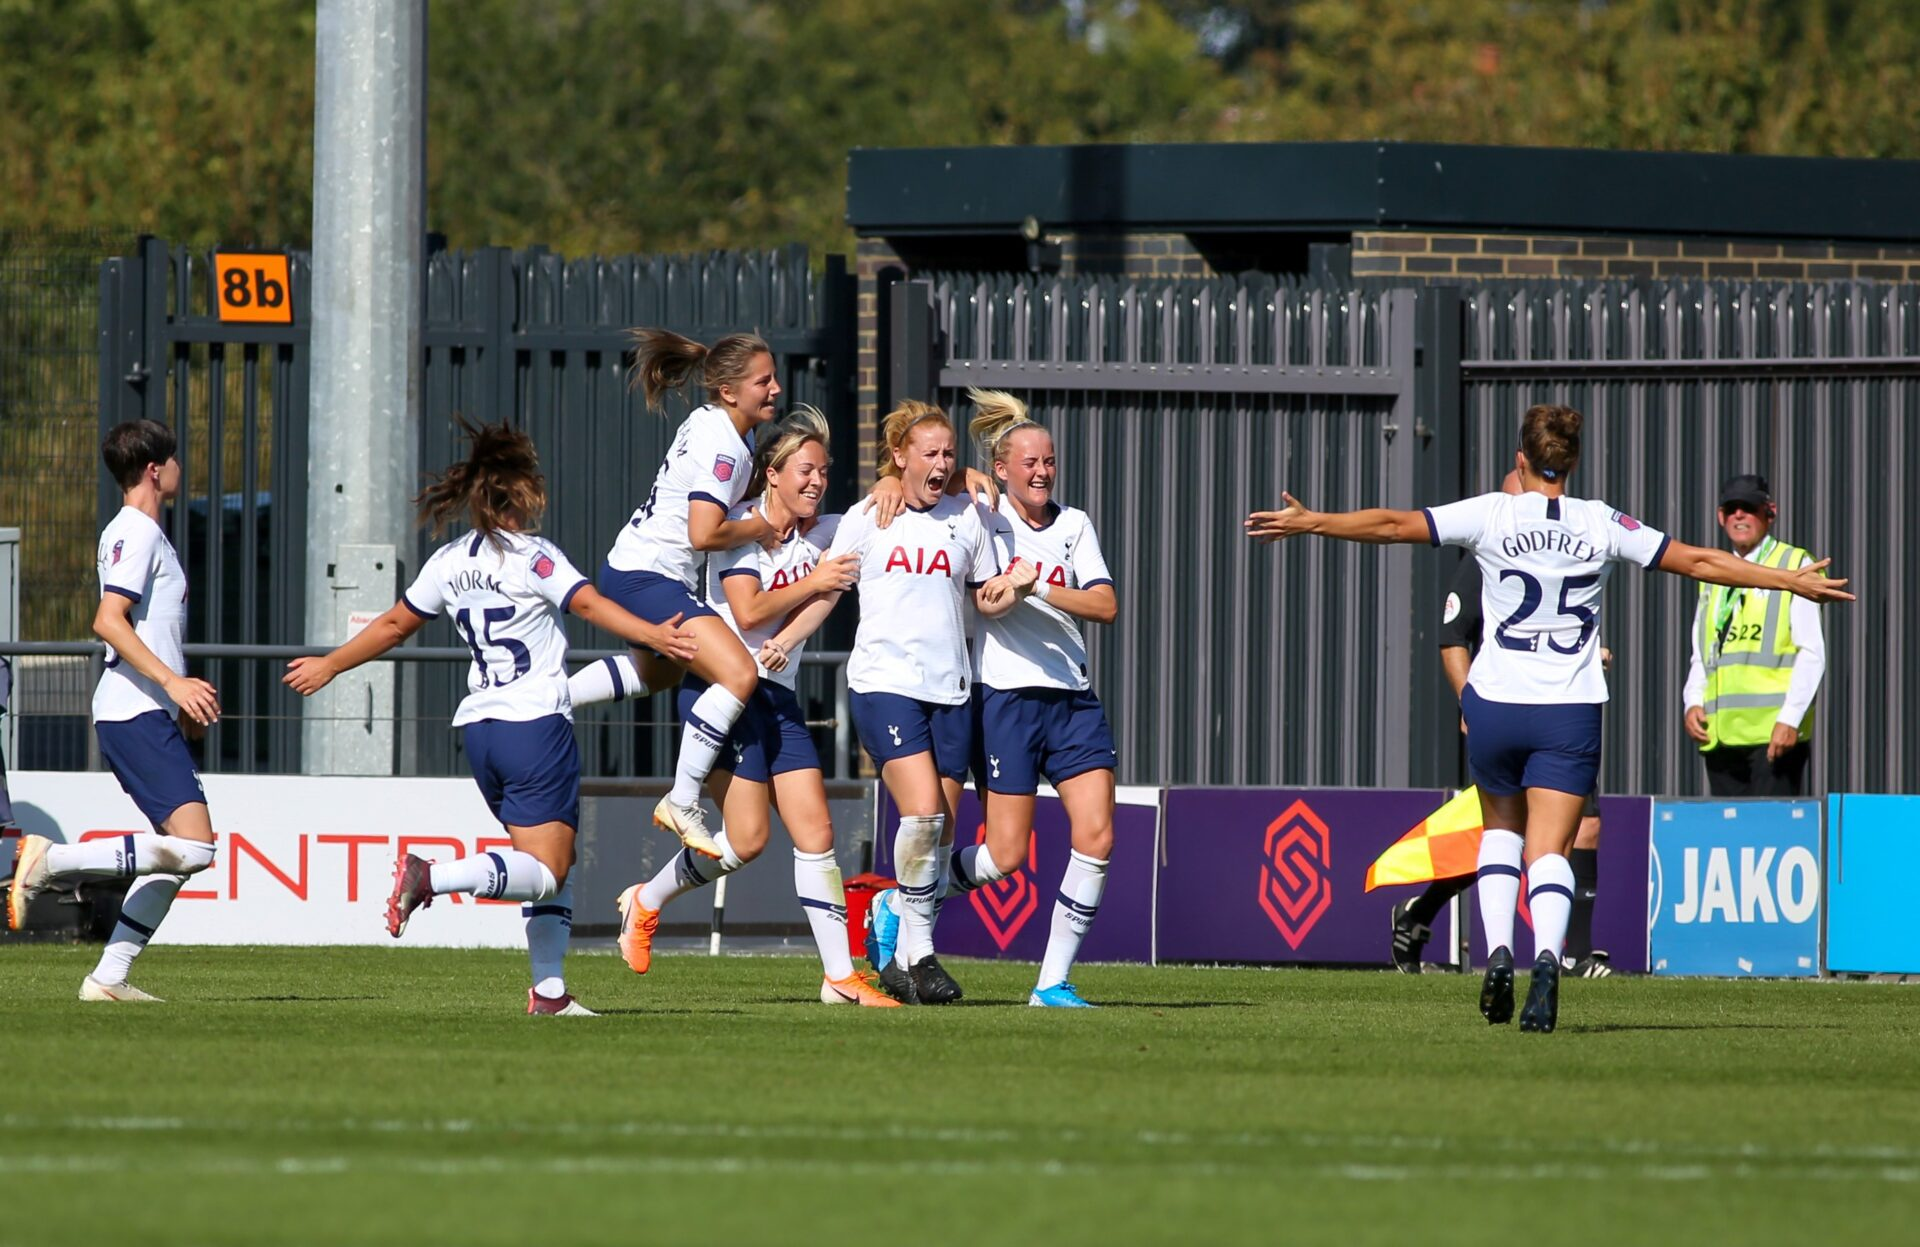 Rachel Furness and team mates celebrating Tottenham Hotspur first ever goal in the FA Women's Super League